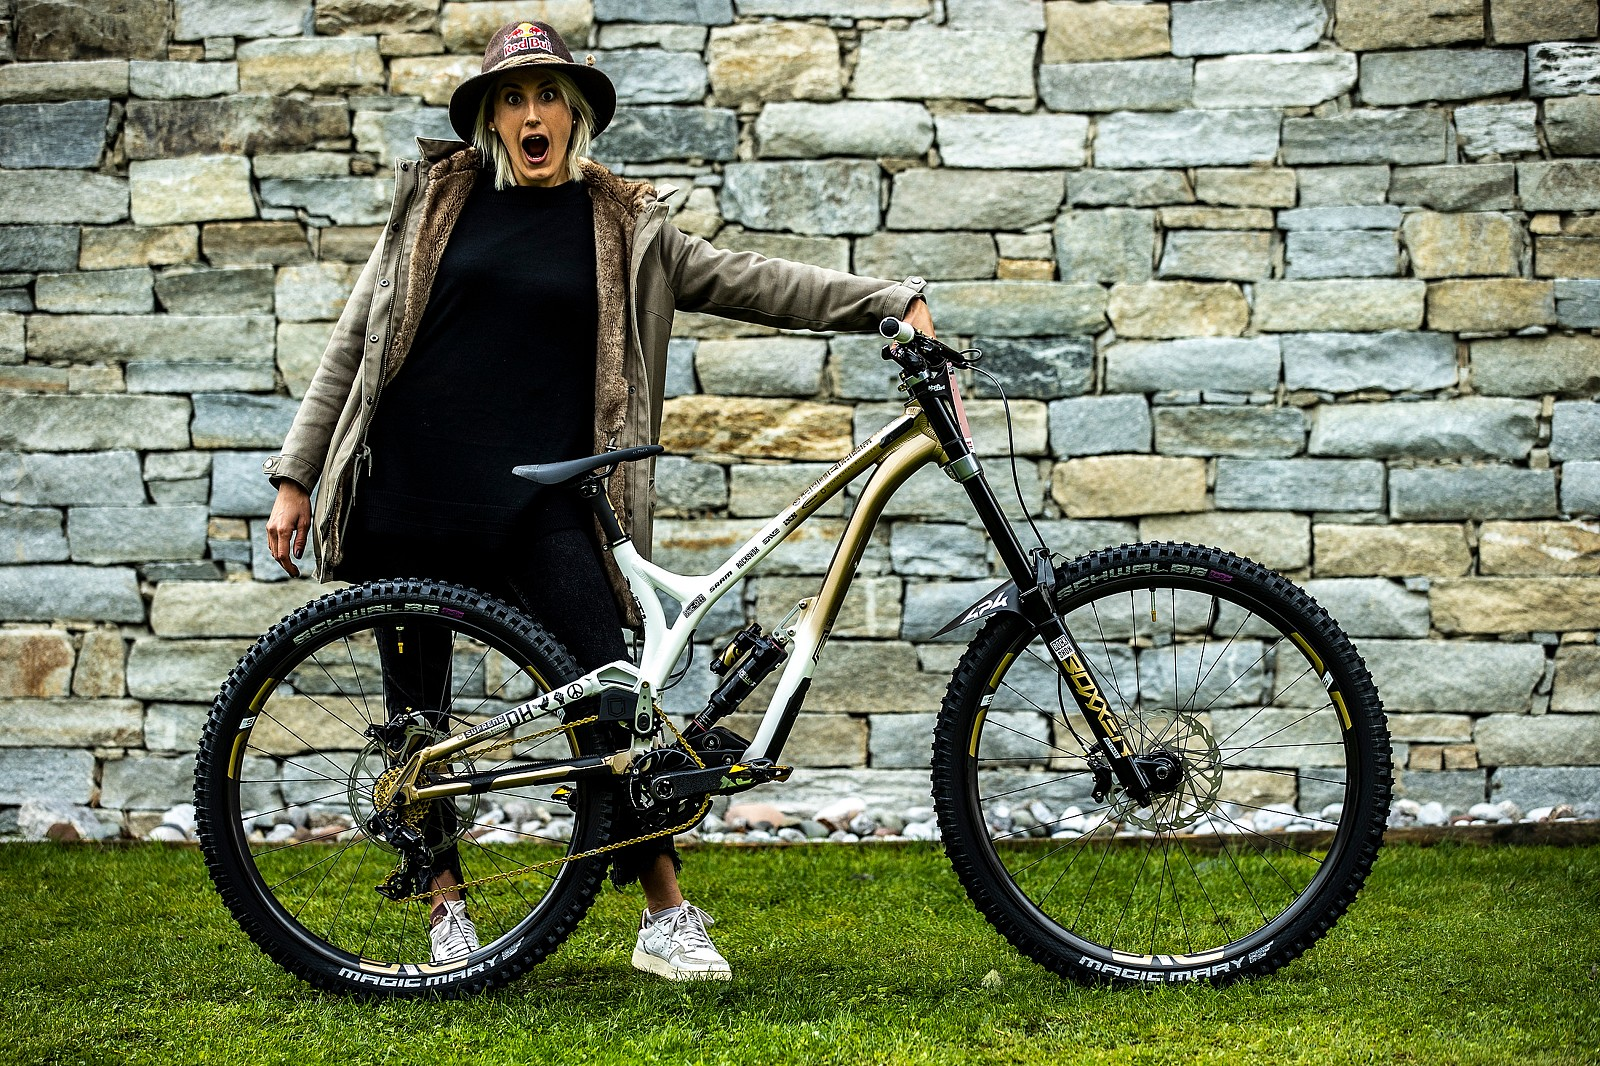 WORLD CHAMPS BIKE - Myriam Nicole's Commencal Supreme - WORLD CHAMPS BIKE - Myriam Nicole's Commencal Supreme - Mountain Biking Pictures - Vital MTB